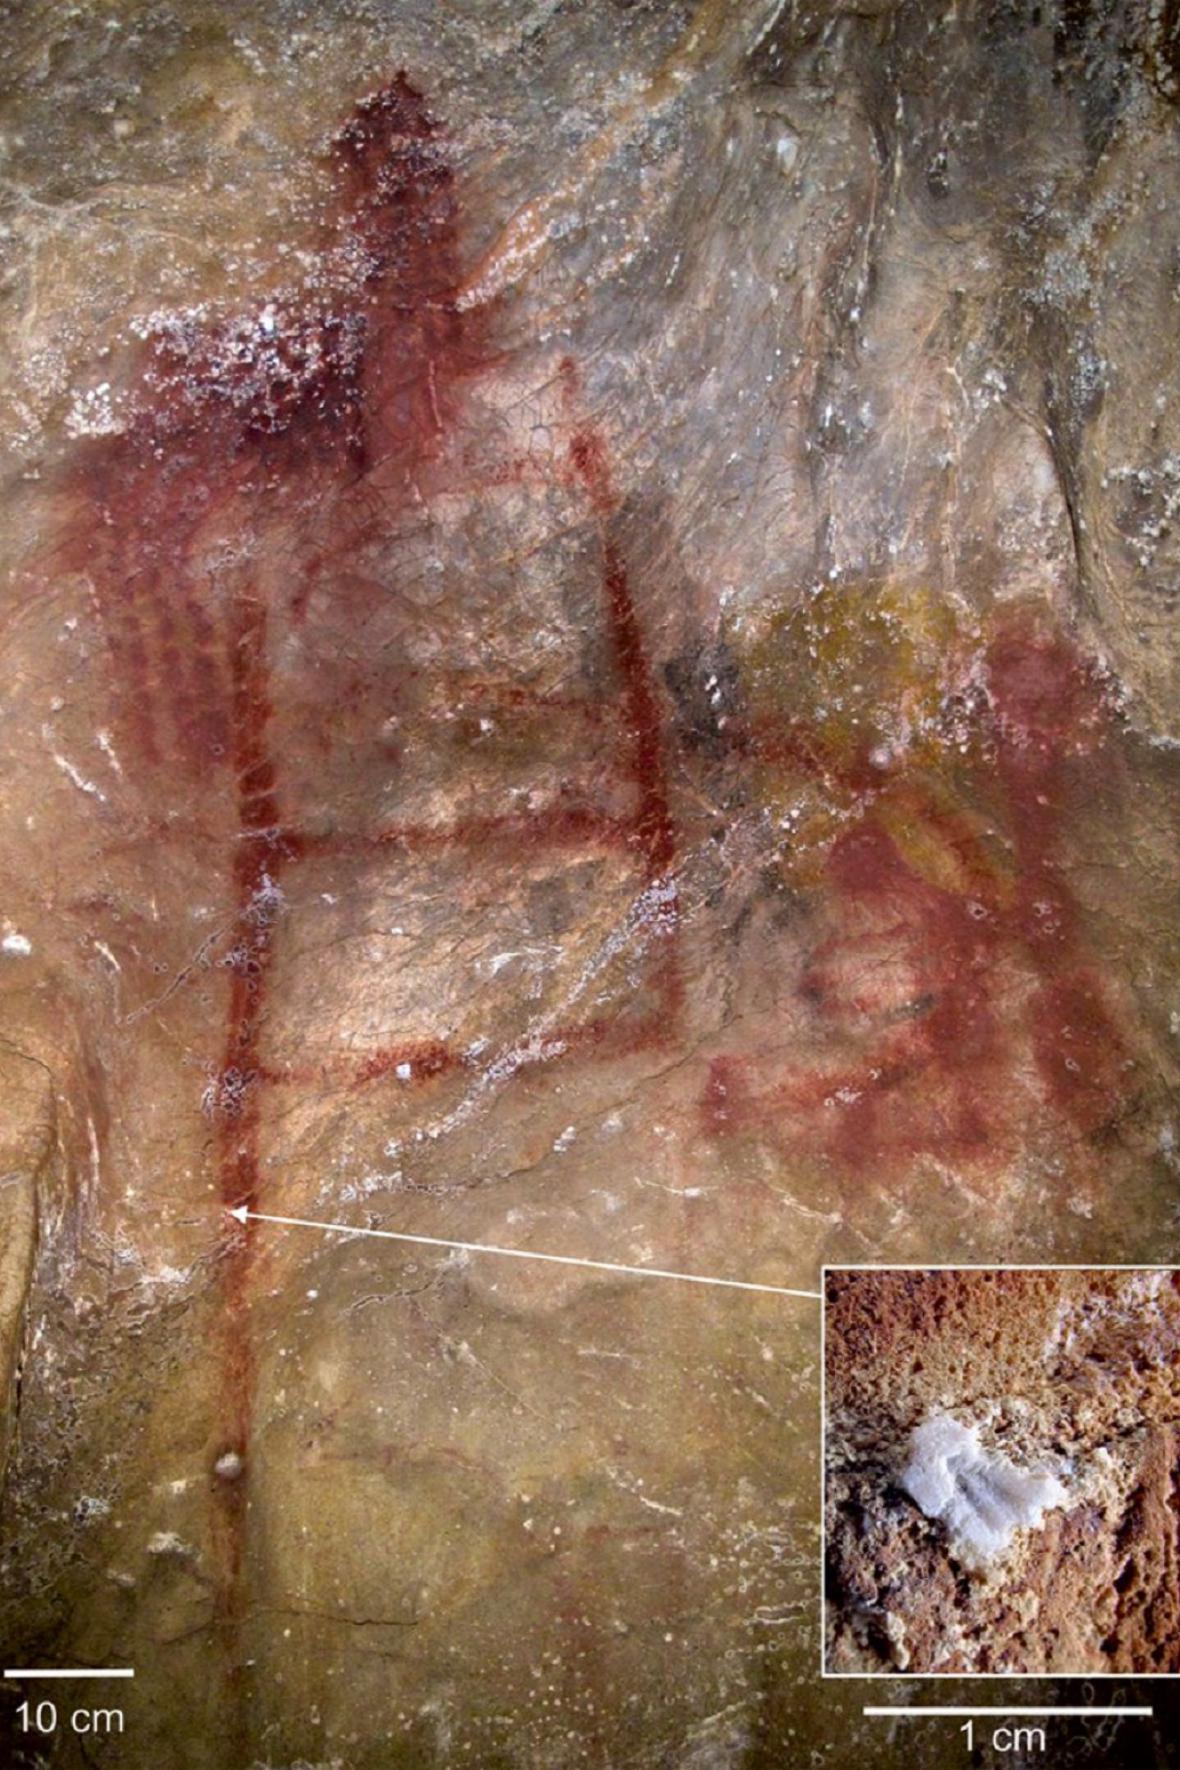 Nejstarsi Jeskynni Umeni Podle Vedcu Vytvareli Neandrtalci Kresby